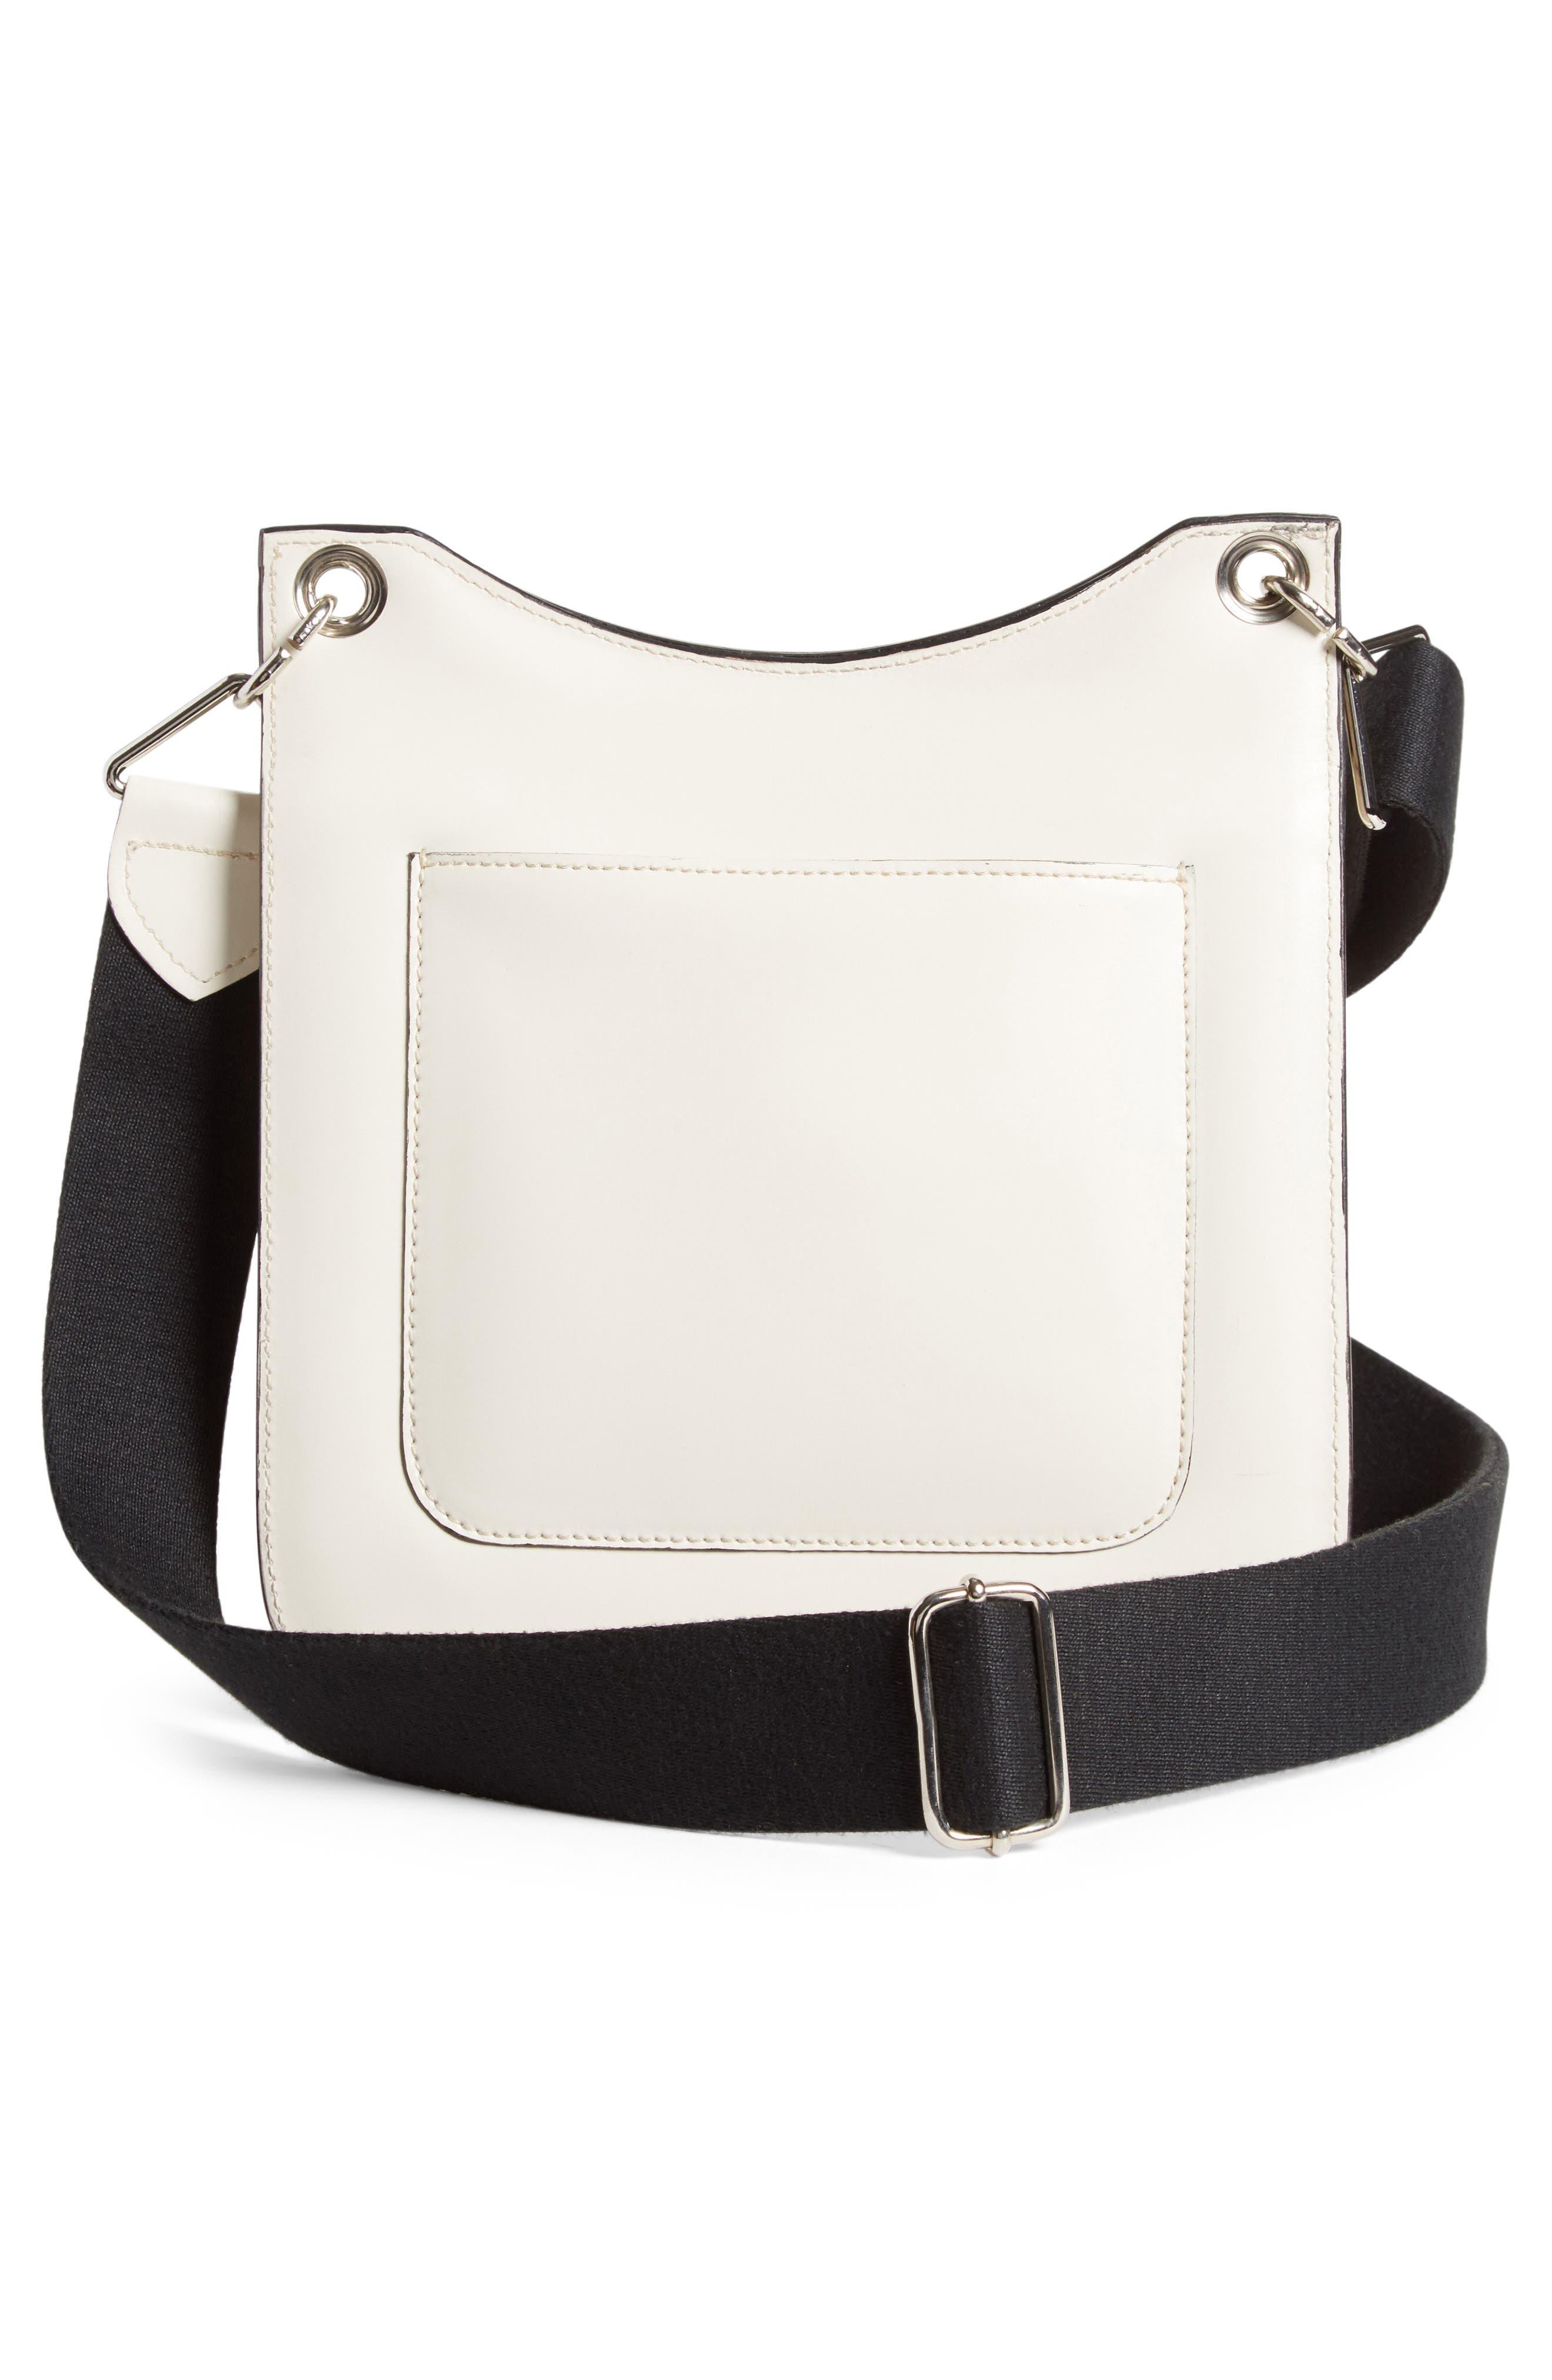 Equestrian Crossbody Bag,                             Alternate thumbnail 3, color,